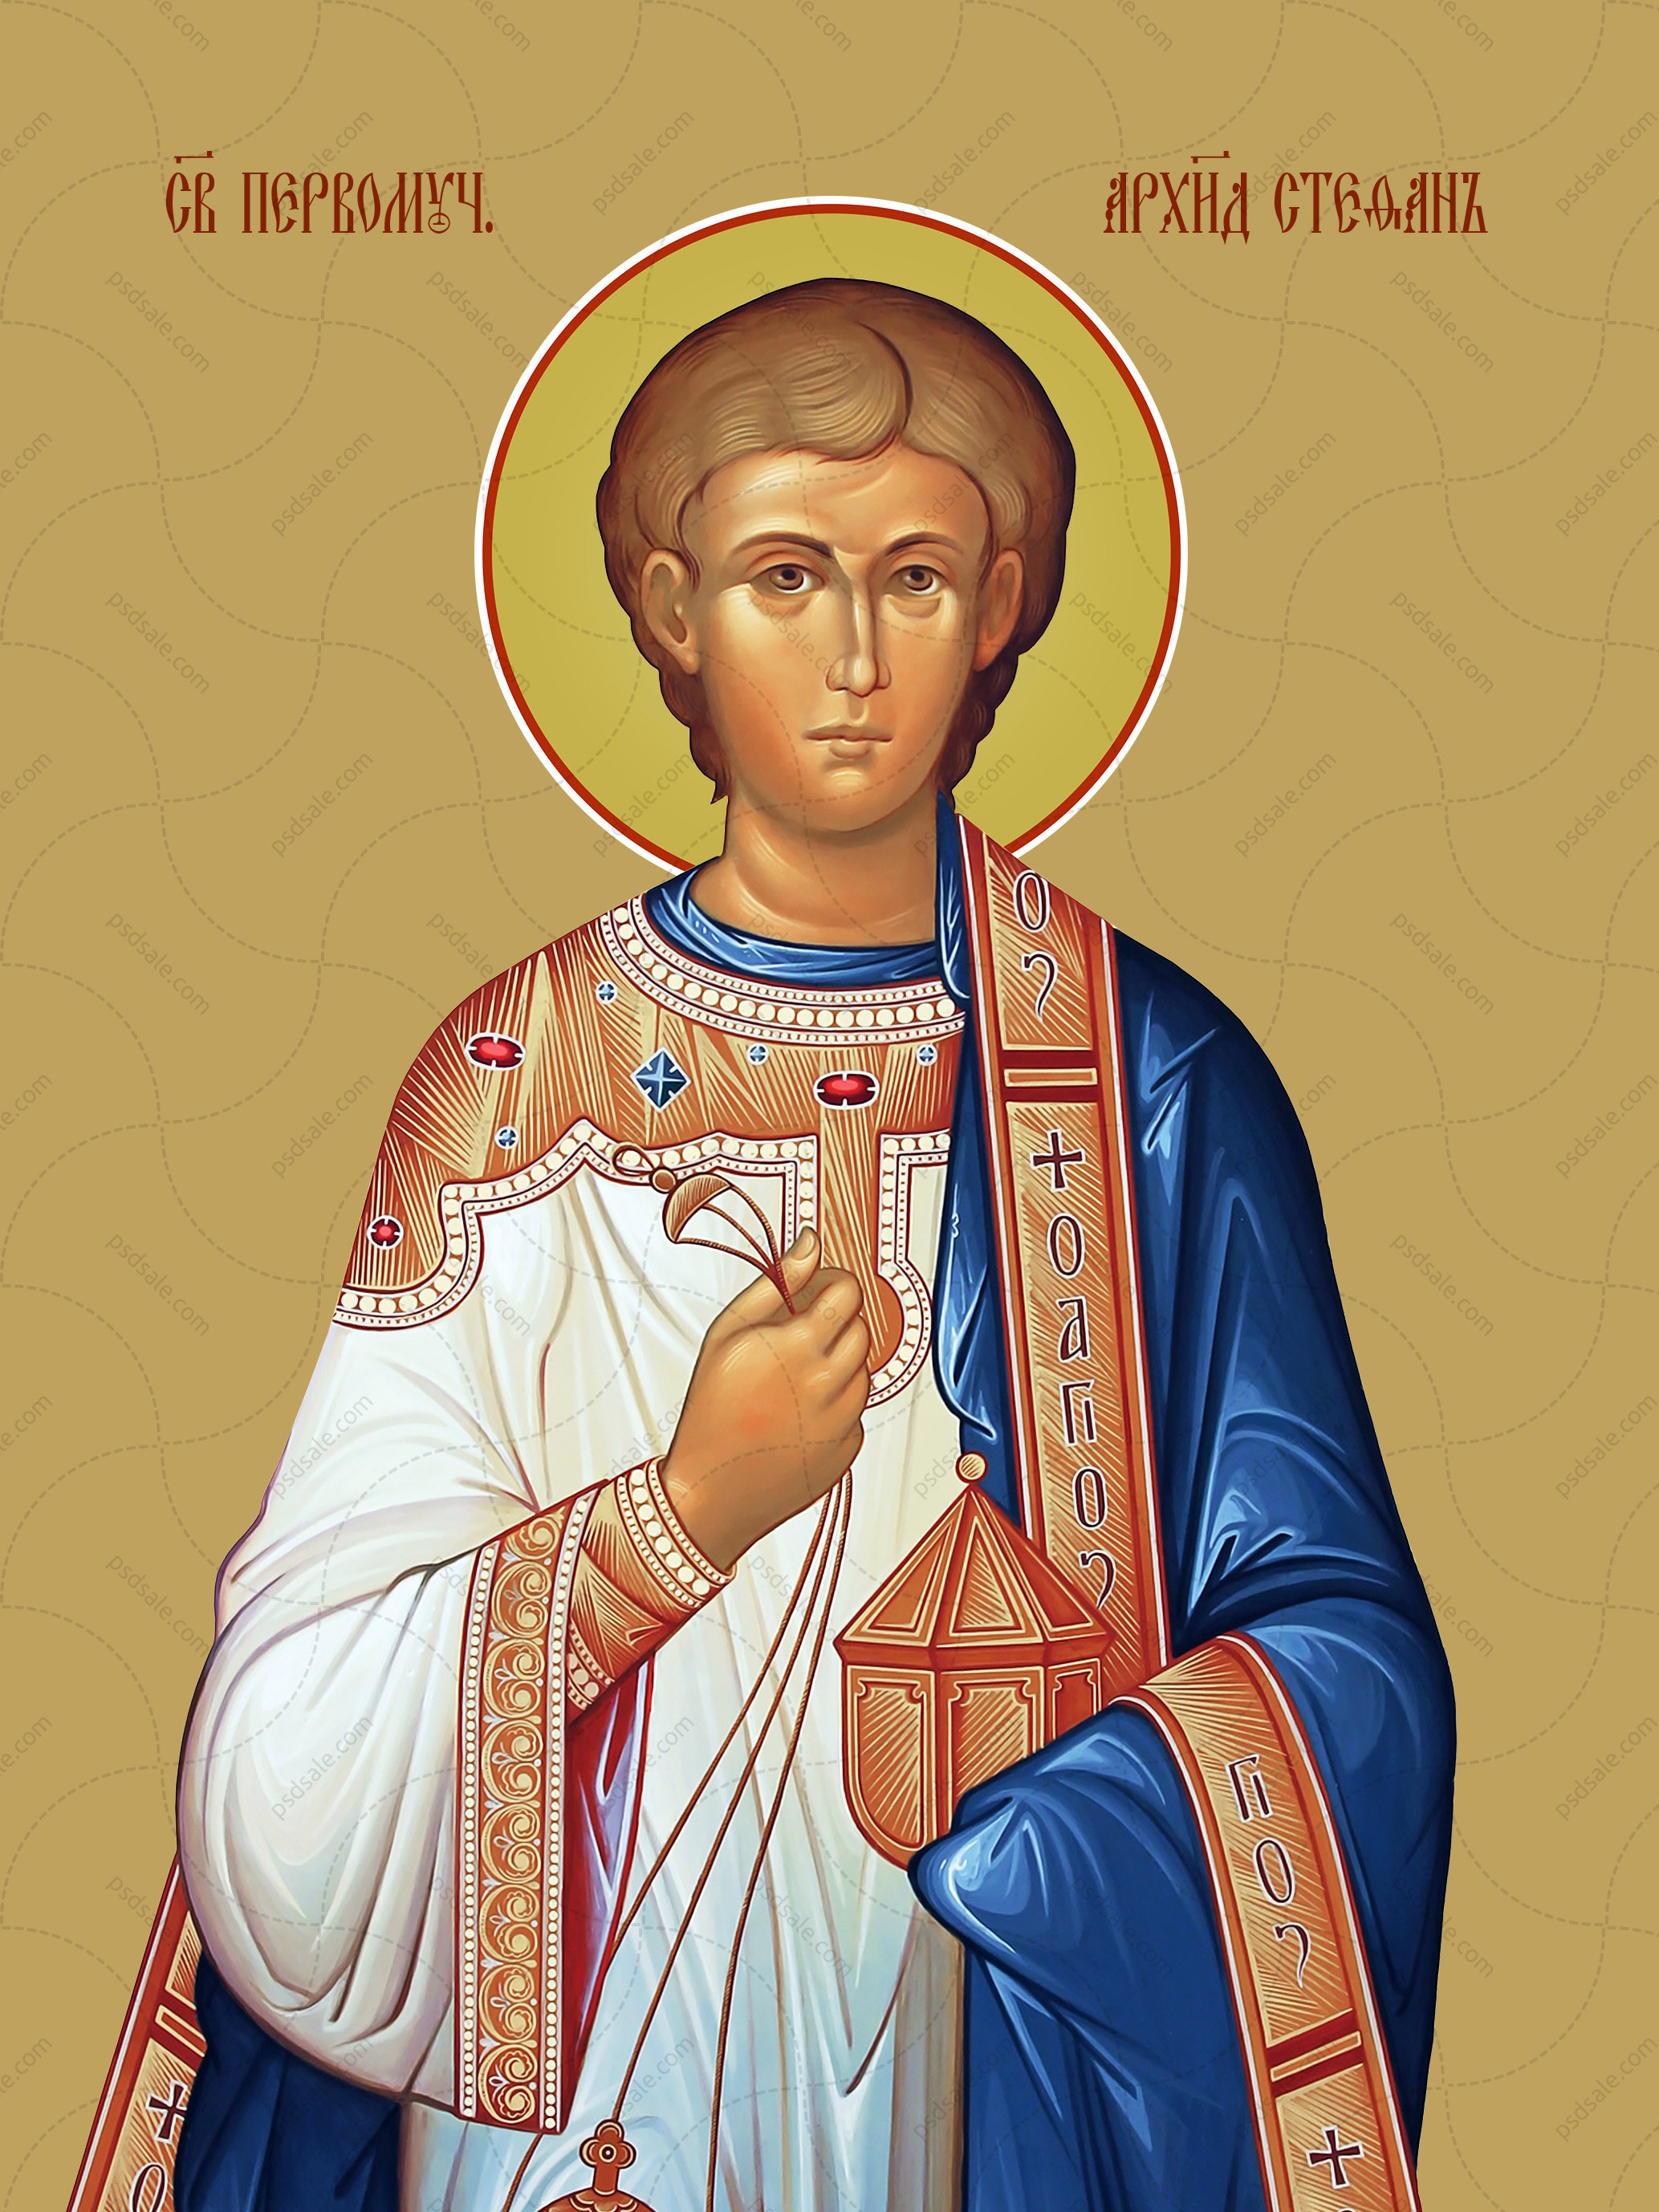 гостиной икона святого стефана фото фото- видеосъемке